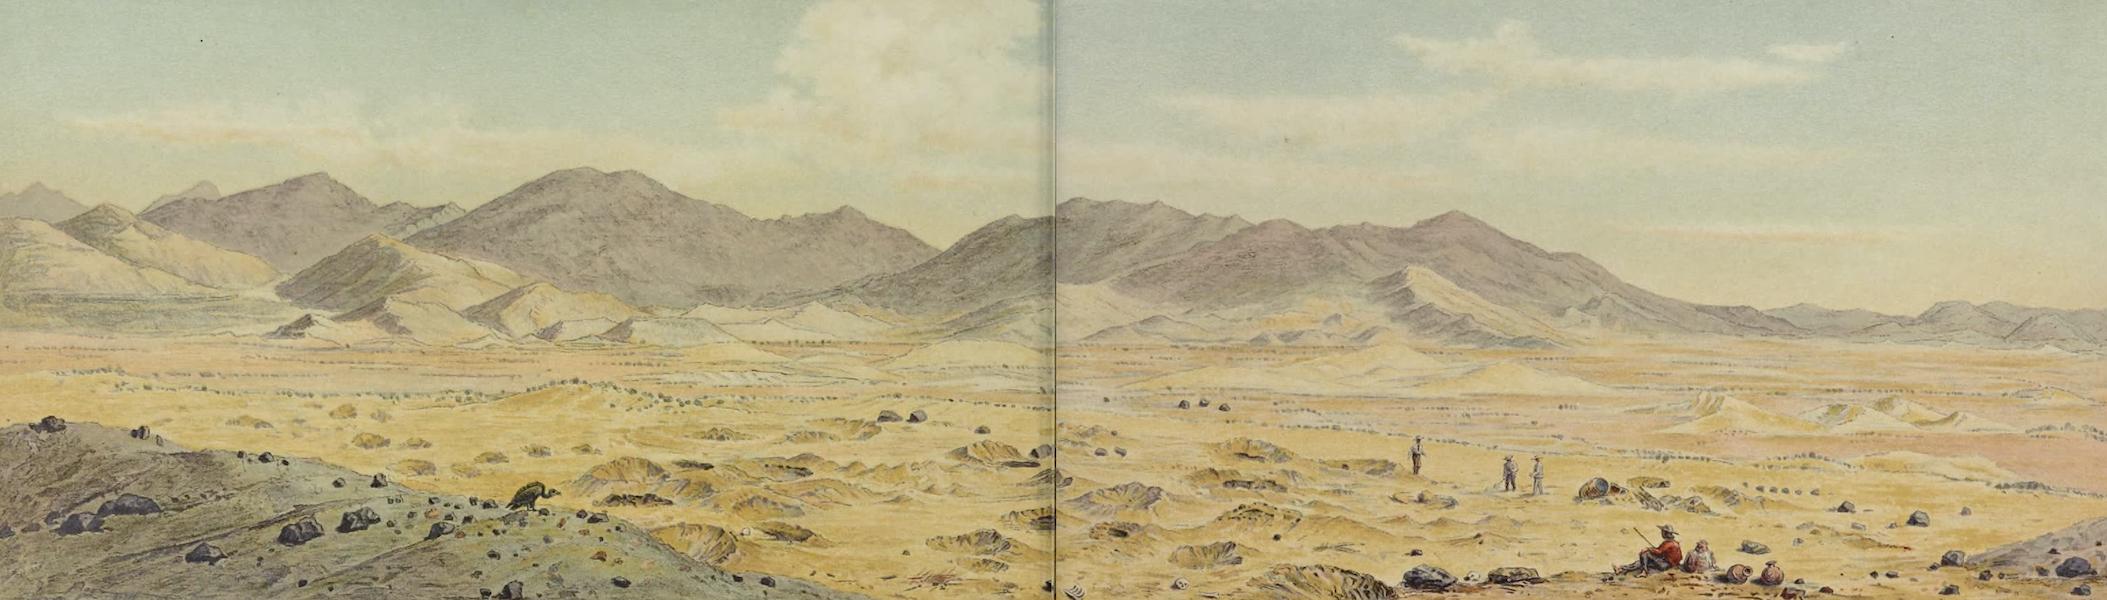 The Necropolis of Ancon Vol. 1 - The Necropolis of Ancon (1880)